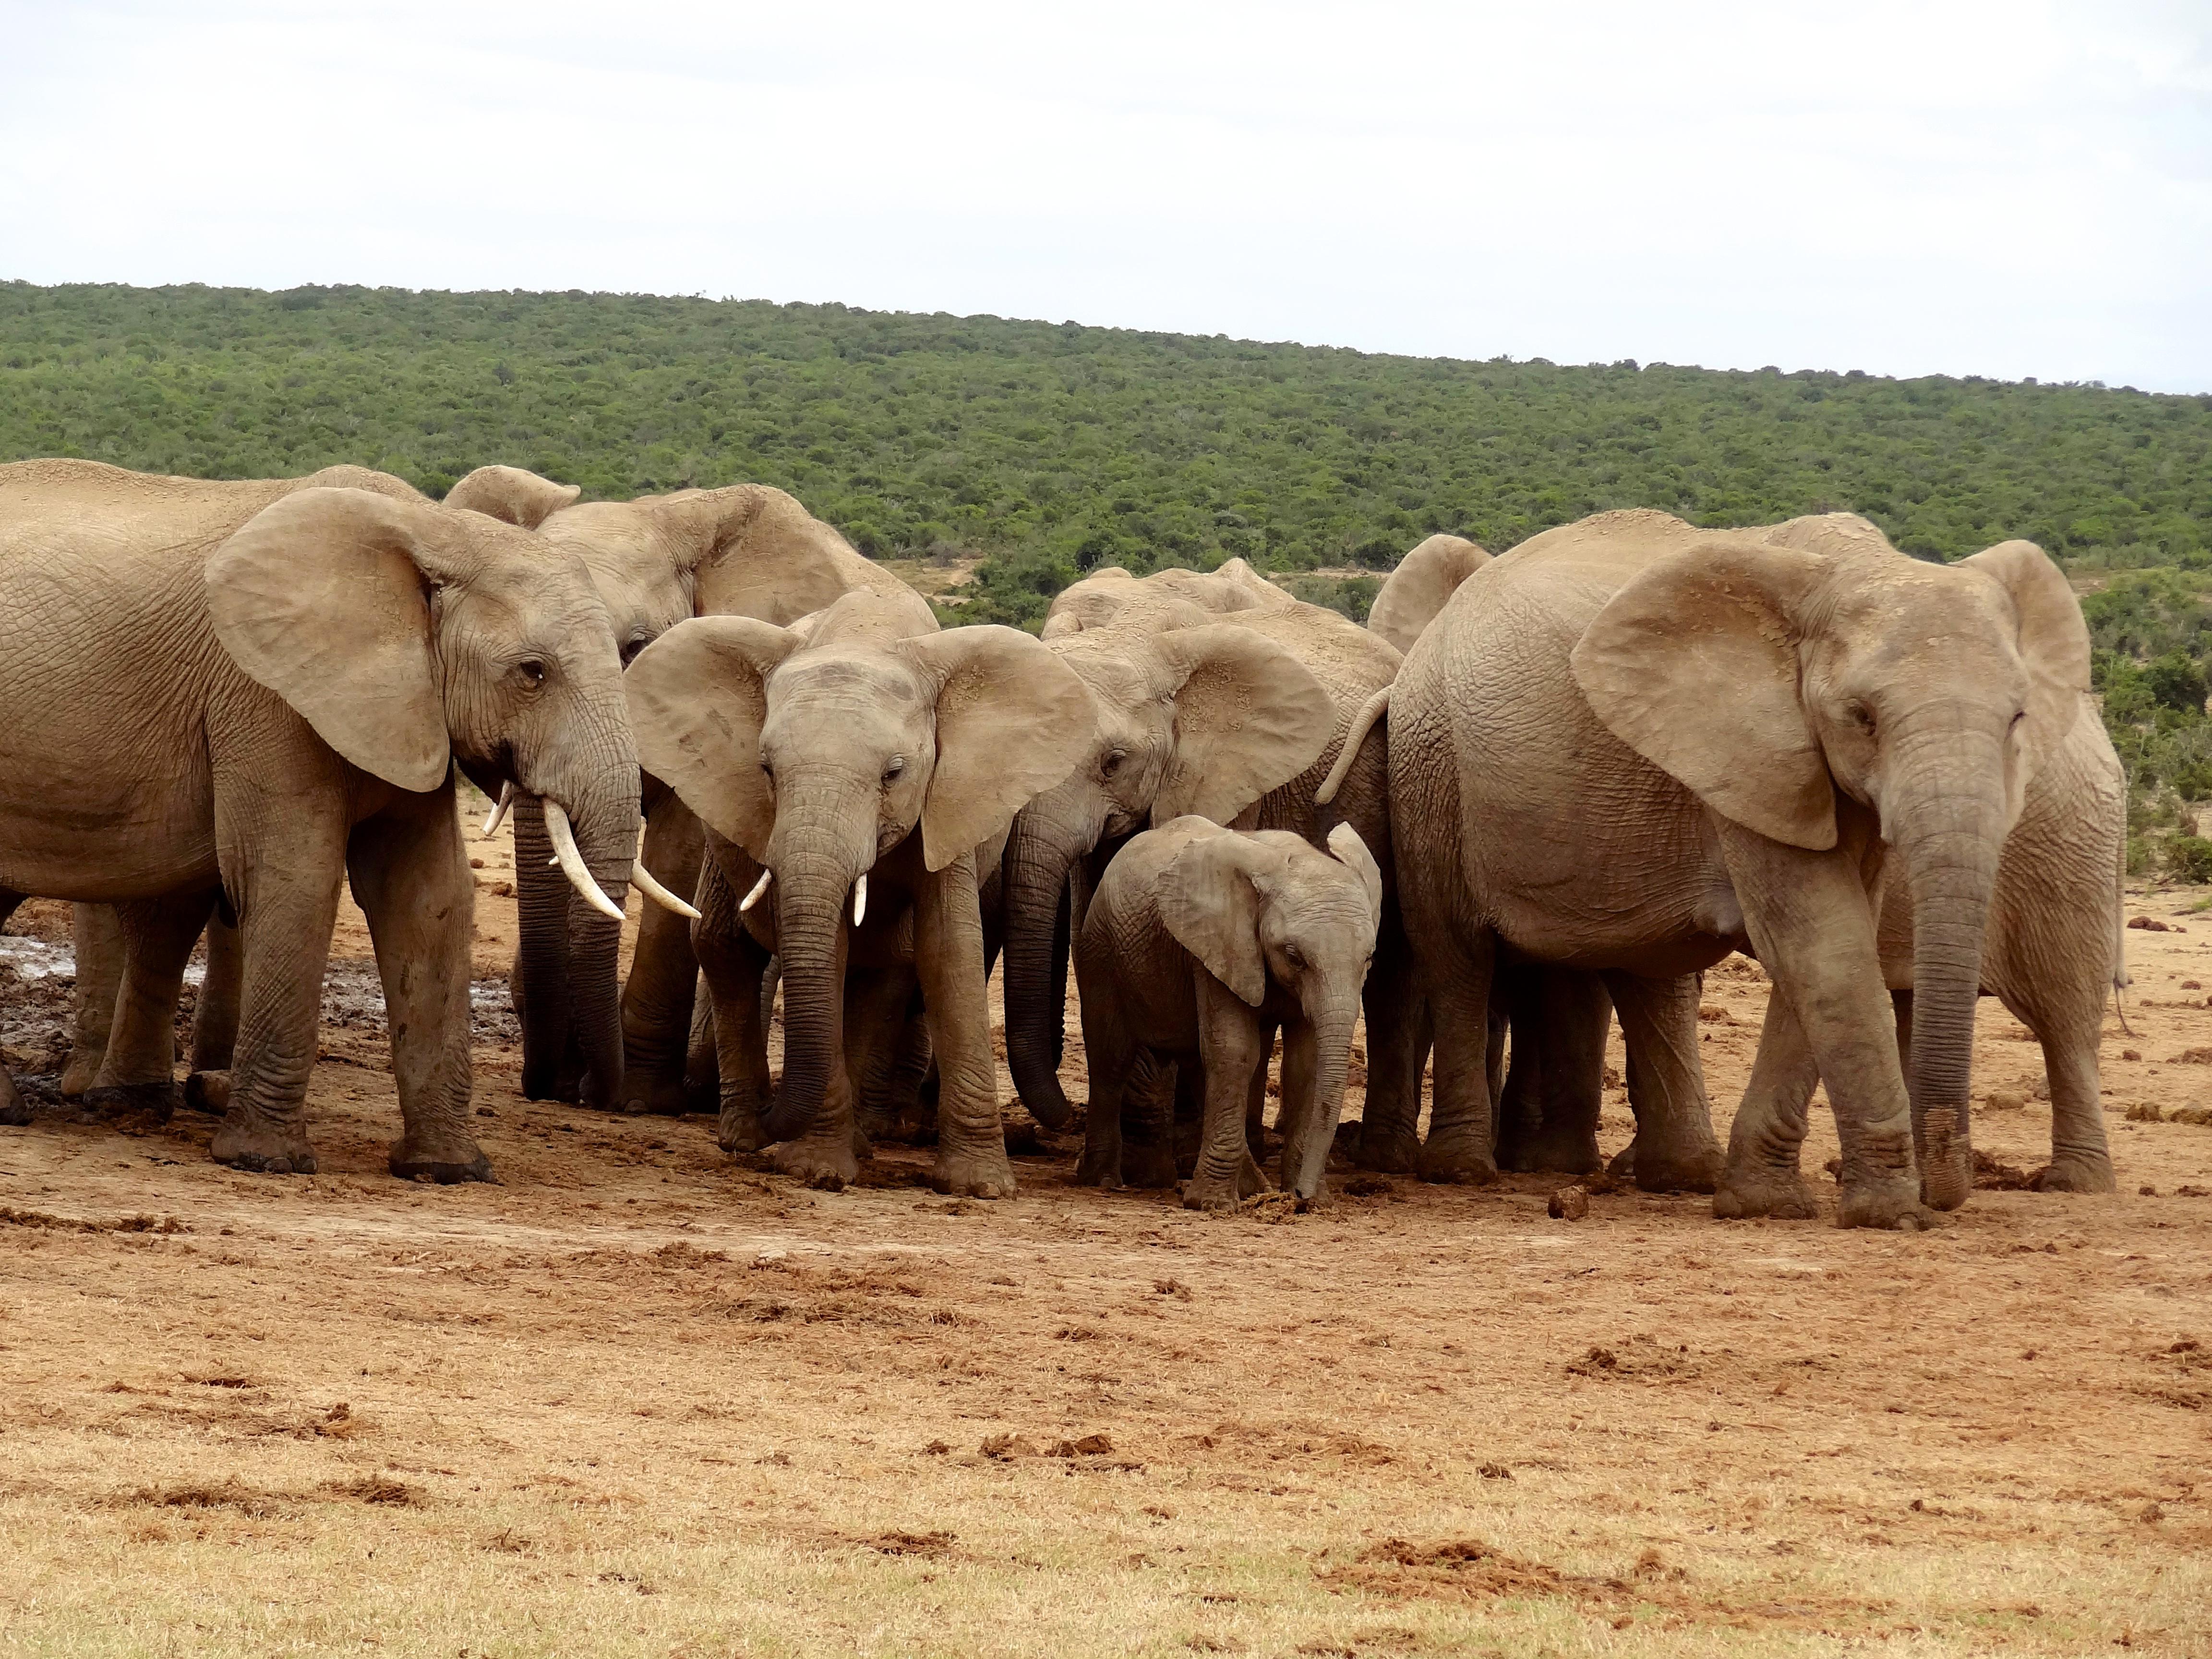 Addo Afrique, Addo Elephant National Park